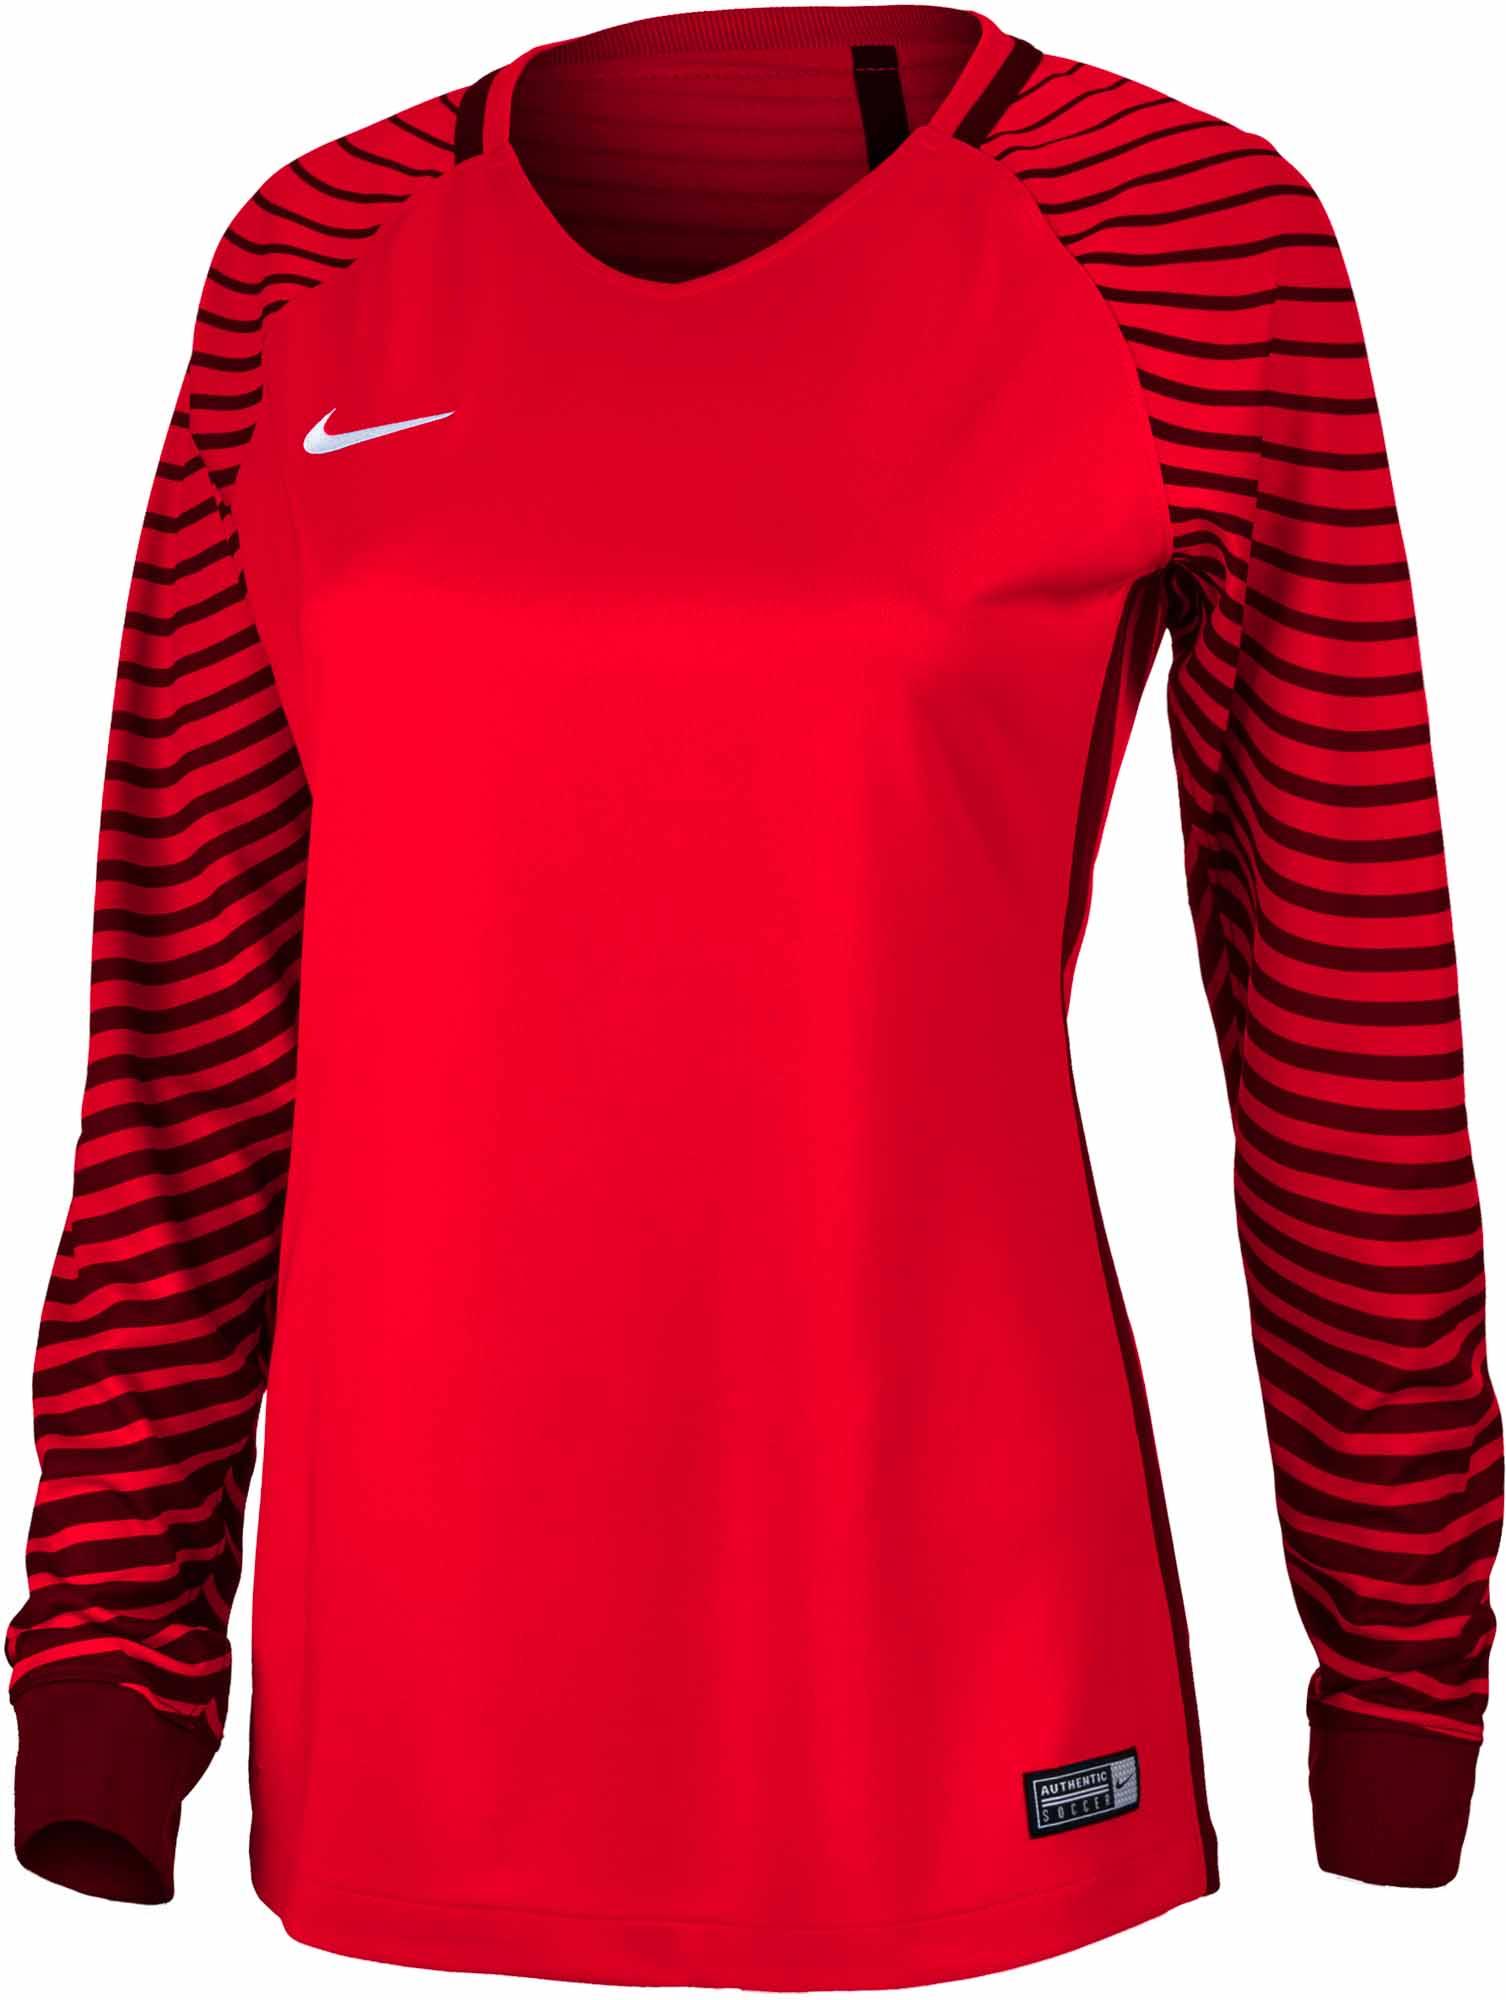 new product 0bbf9 1b3cc Nike Womens Gardien Goalkeeper Jersey – Bright Crimson Deep Garnet